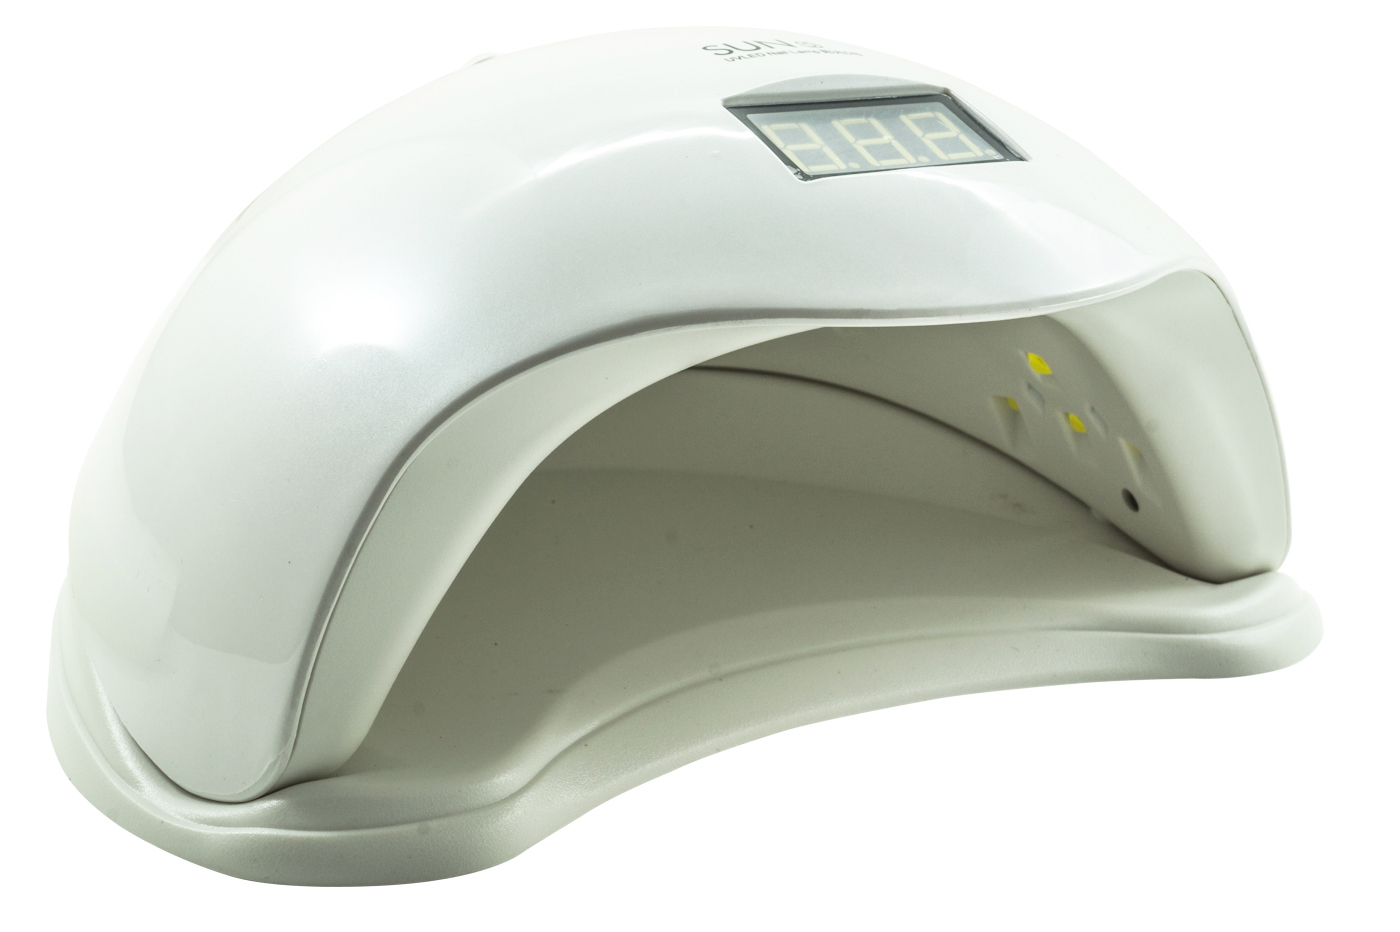 Bes nail art beselettronica lampada uv led w sensore